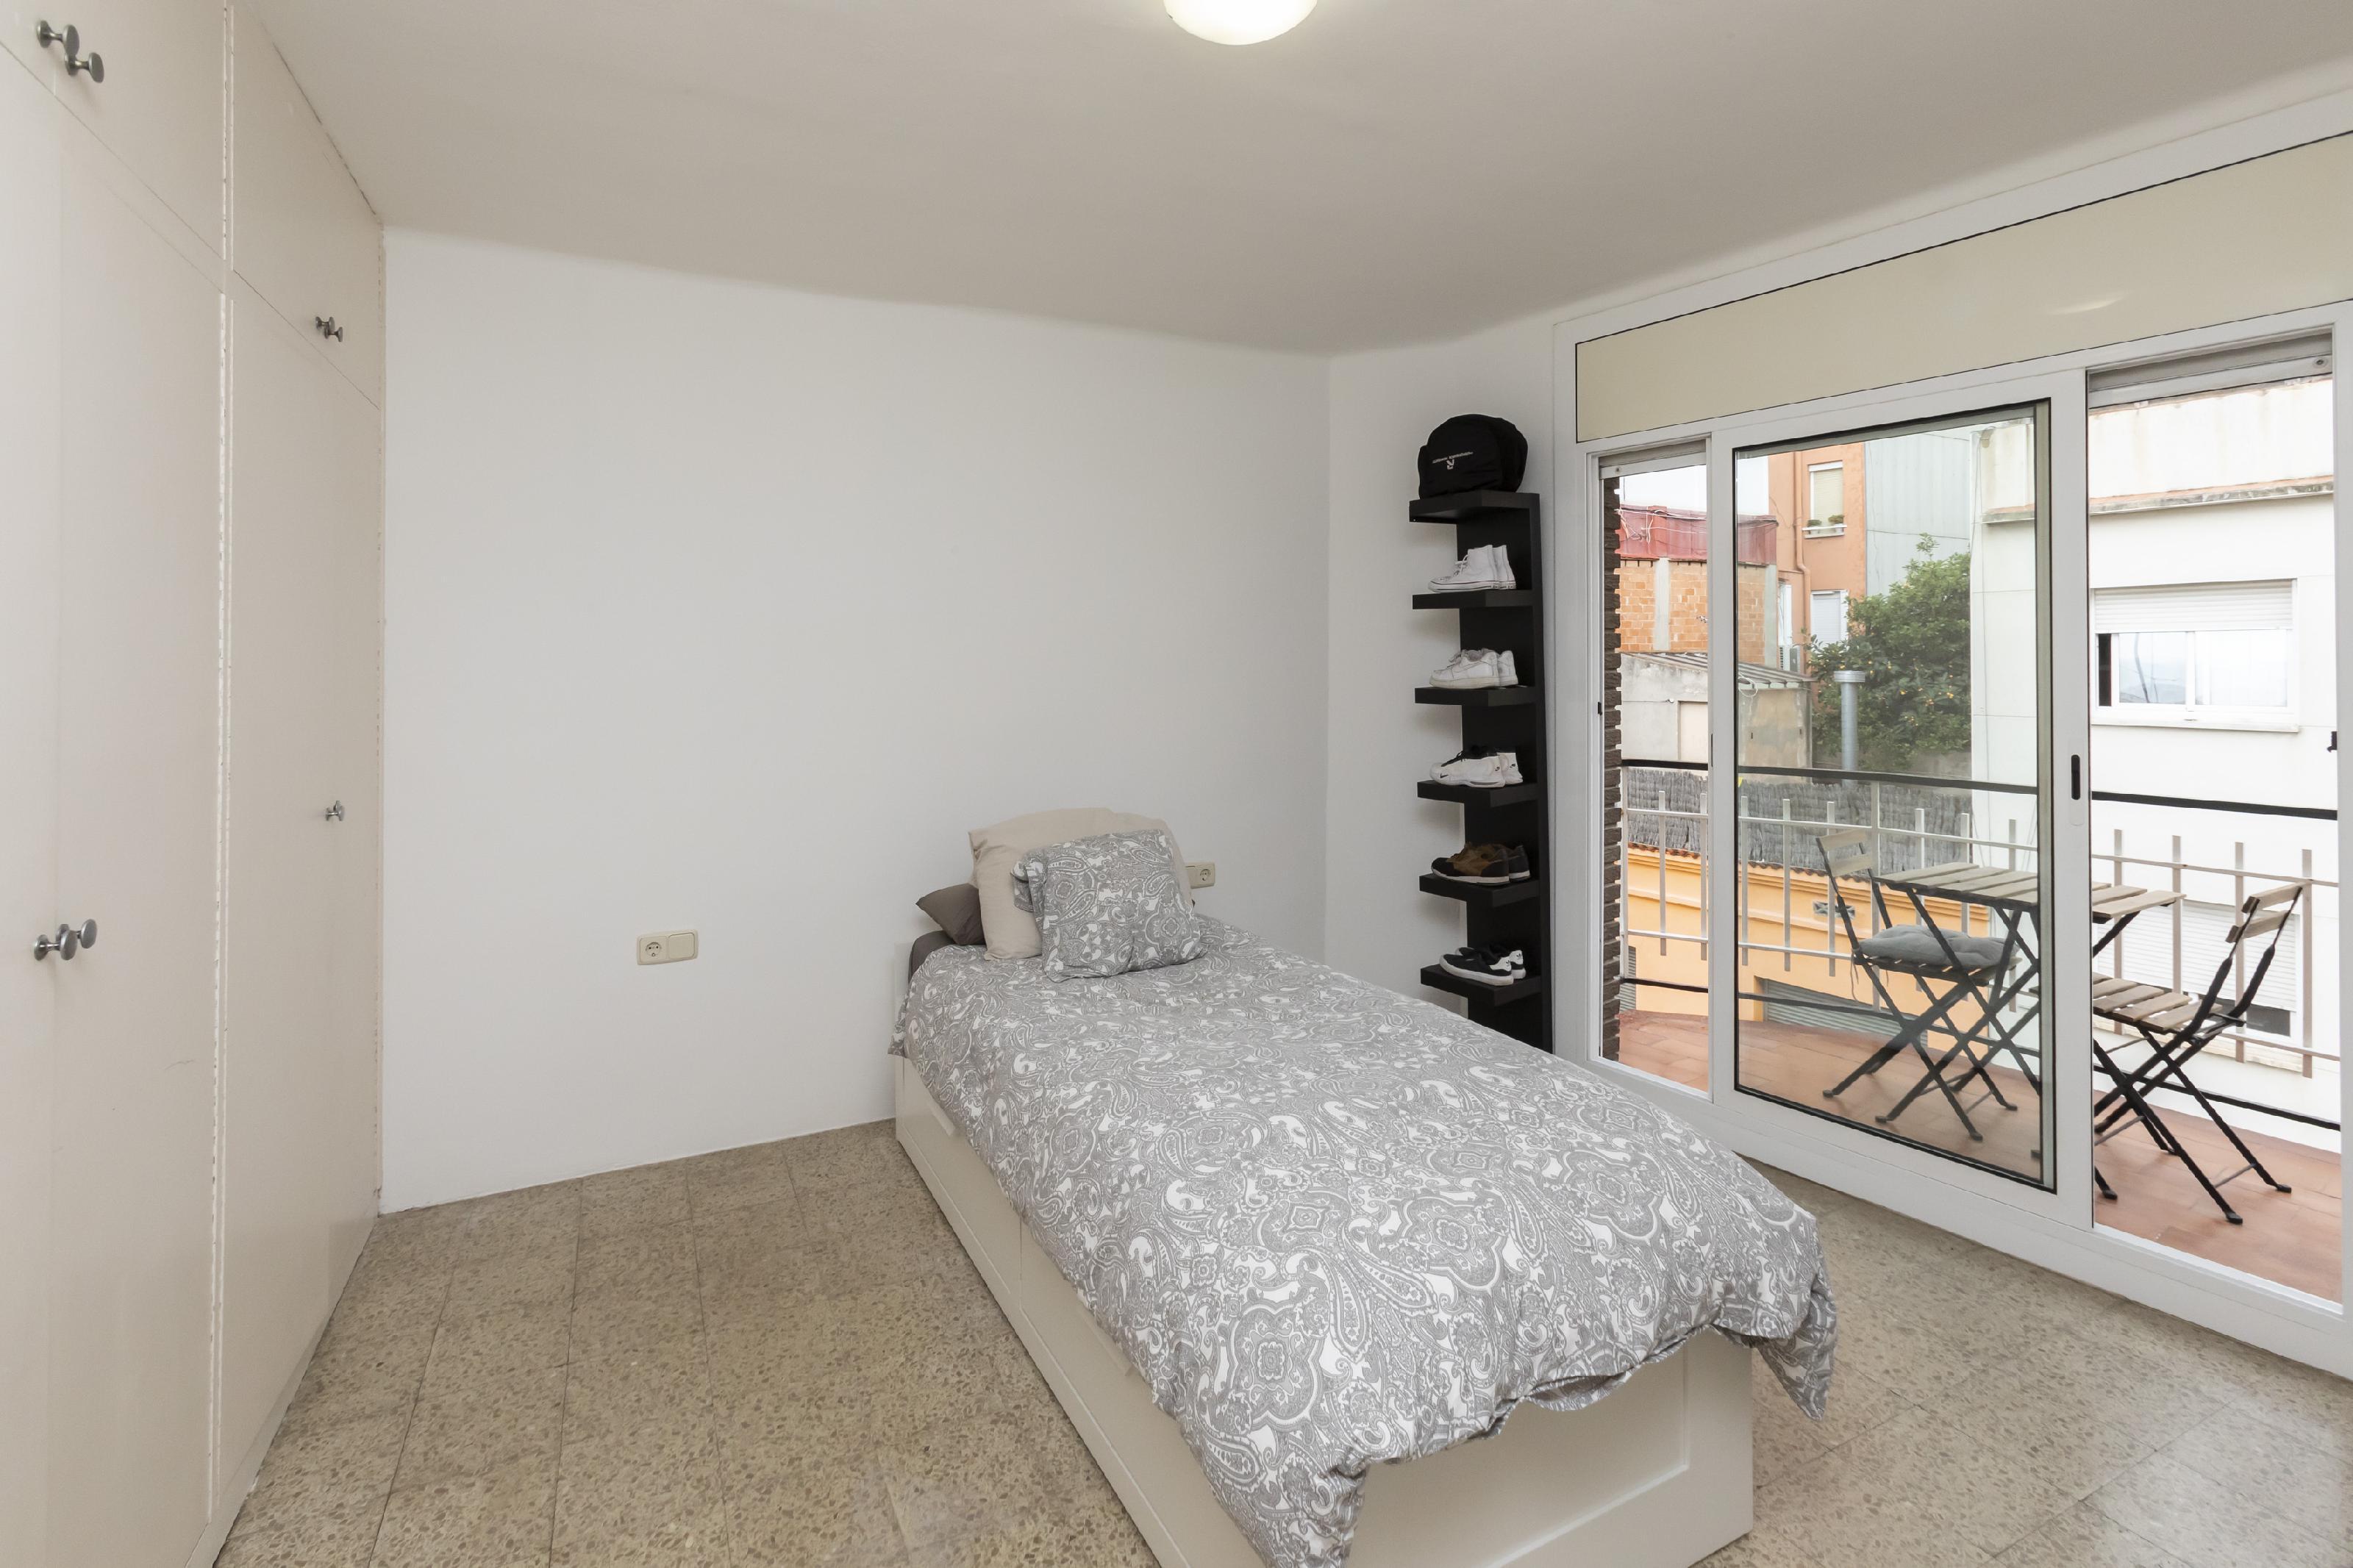 Imagen 4 Piso en venta en Barcelona / José Millán González - Josep Serrano